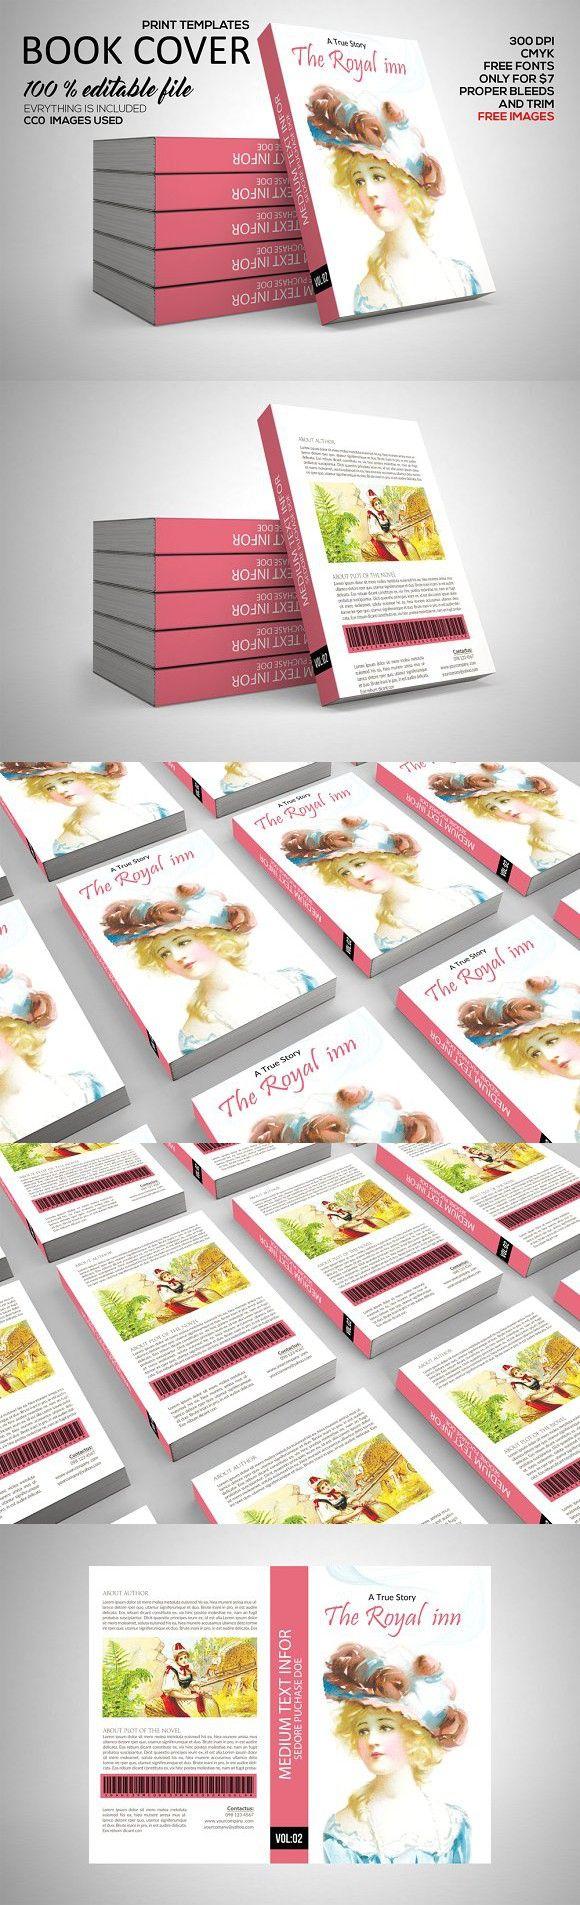 Book Cover Print Template. Gift Voucher Design Templates. $7.00